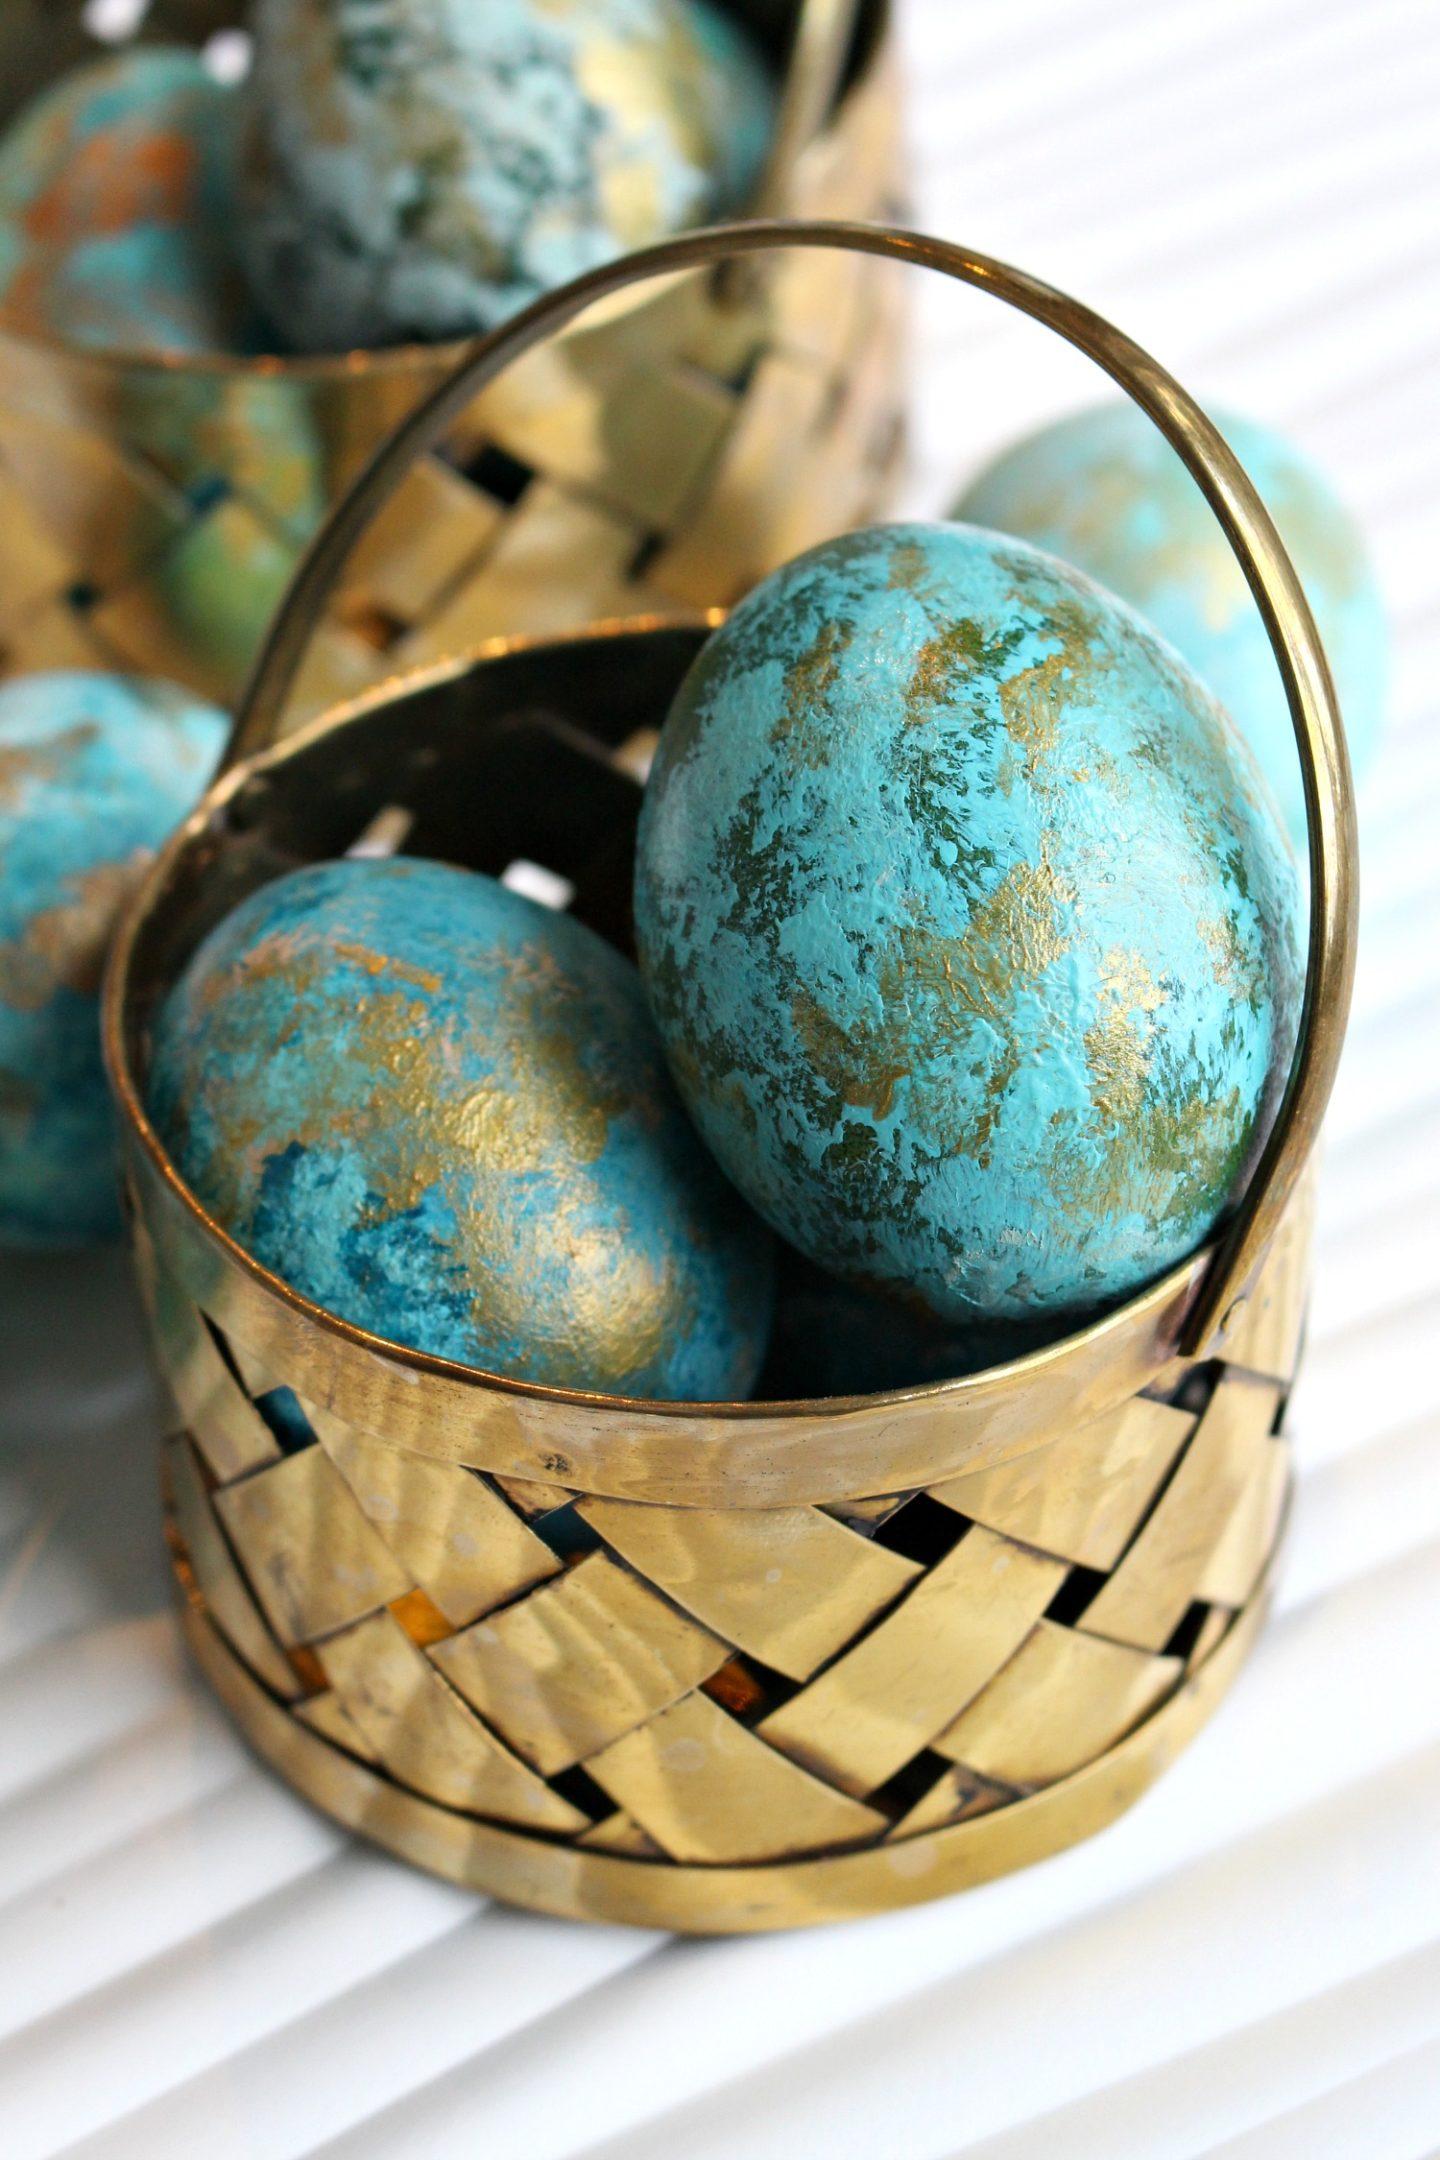 Easter Egg Decorating for Kids